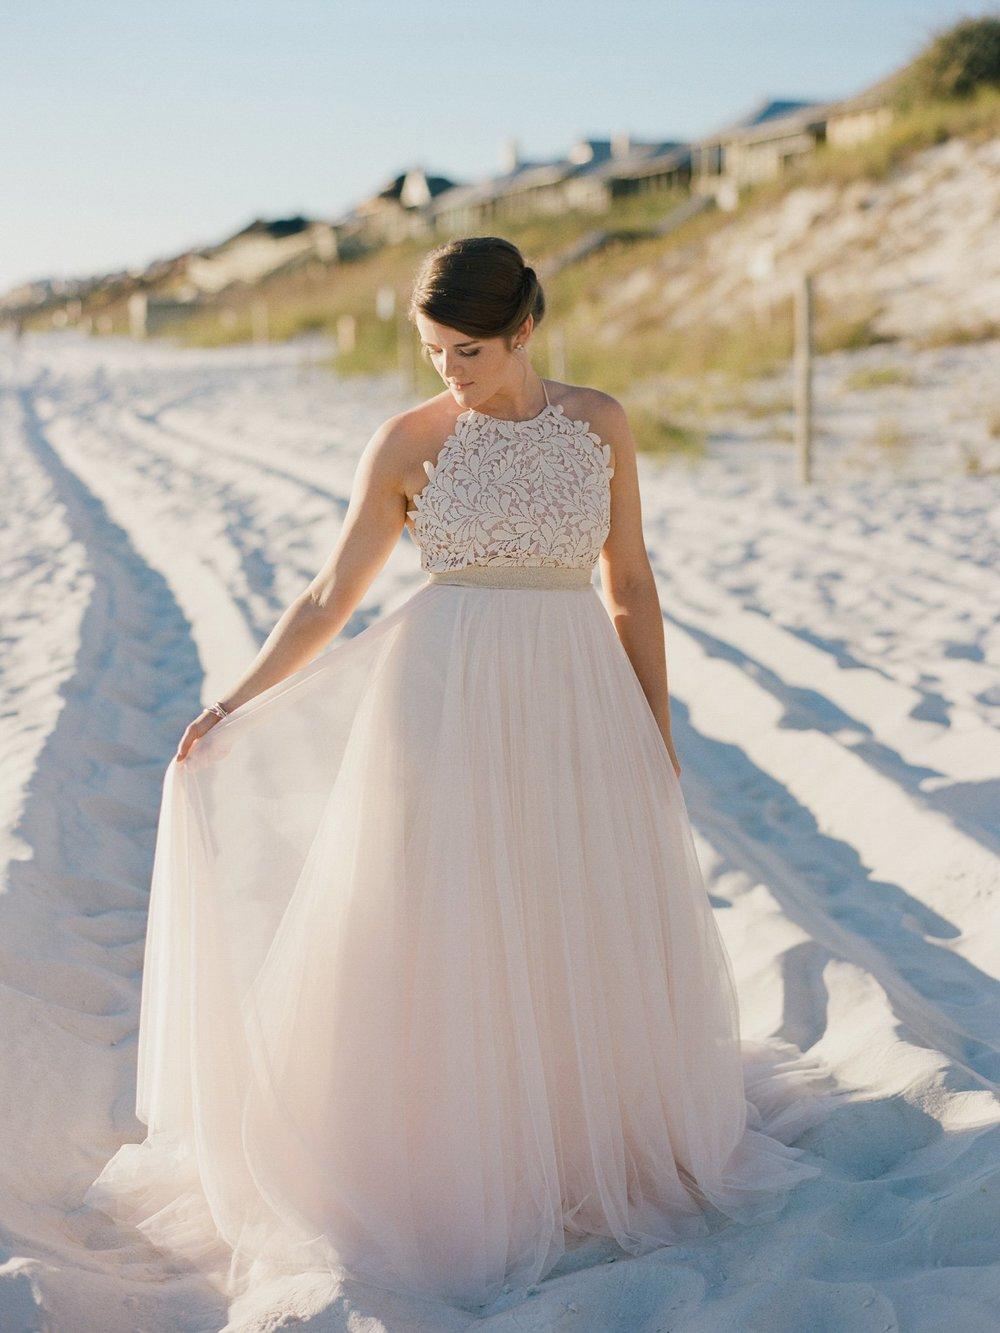 inlet beach wedding 30a wedding inlet beach wedding photographer shannon griffin photography_0038.jpg